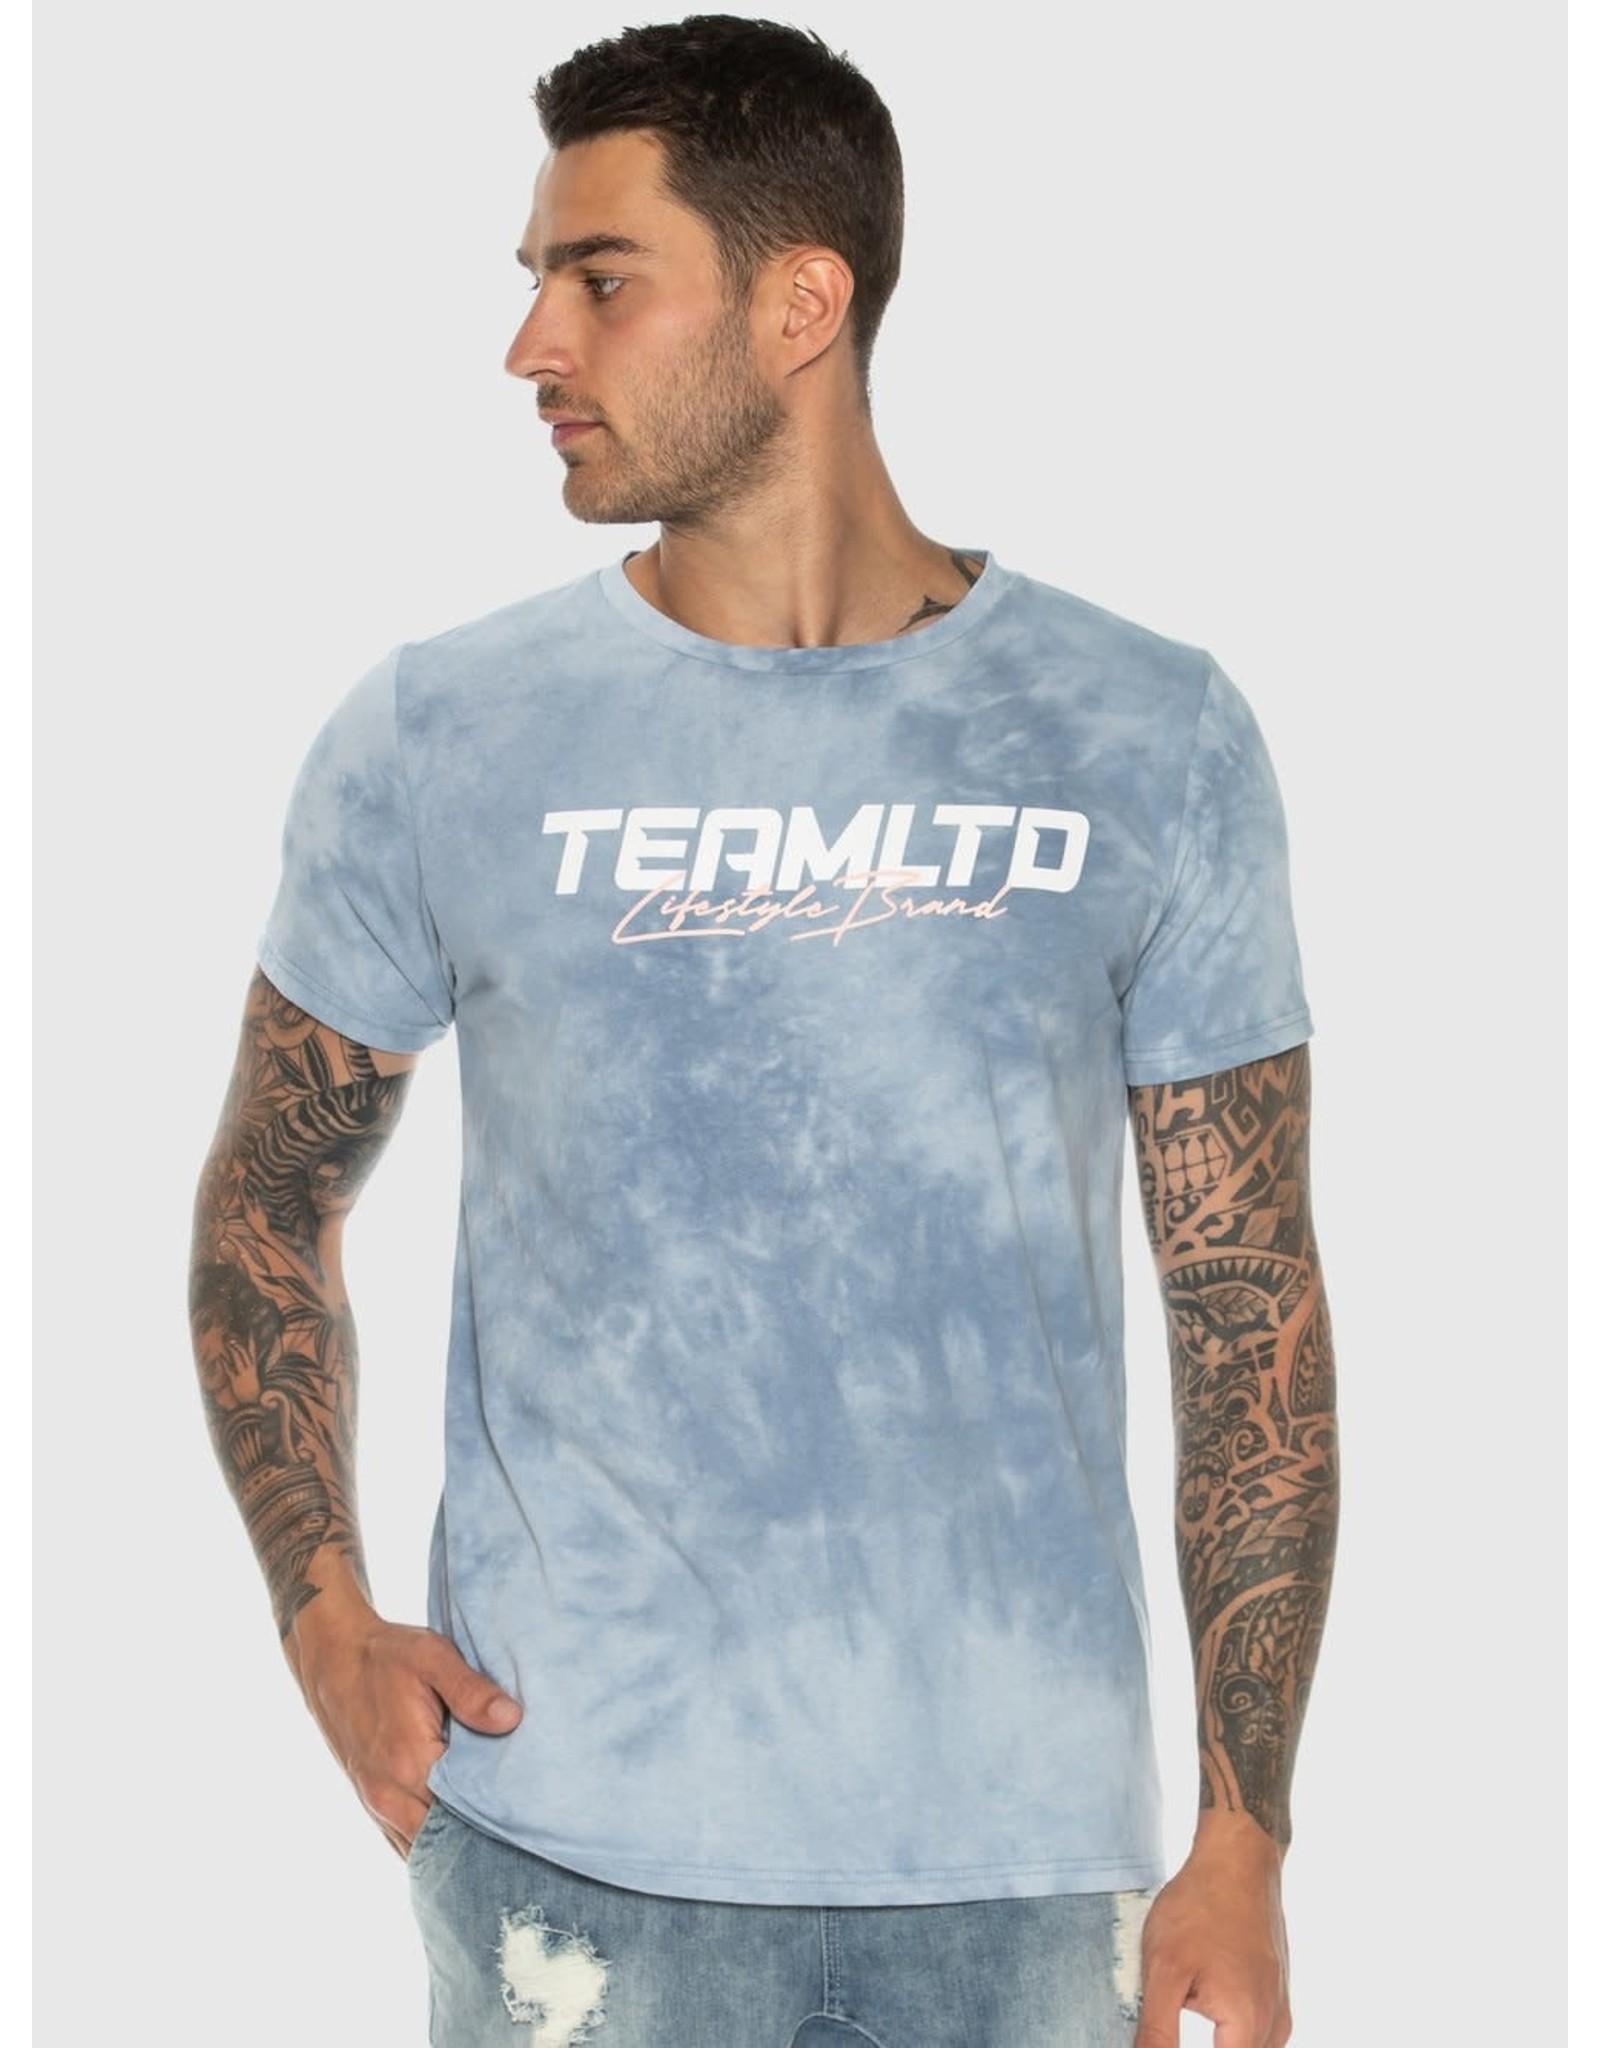 TEAMLTD Tye Dye